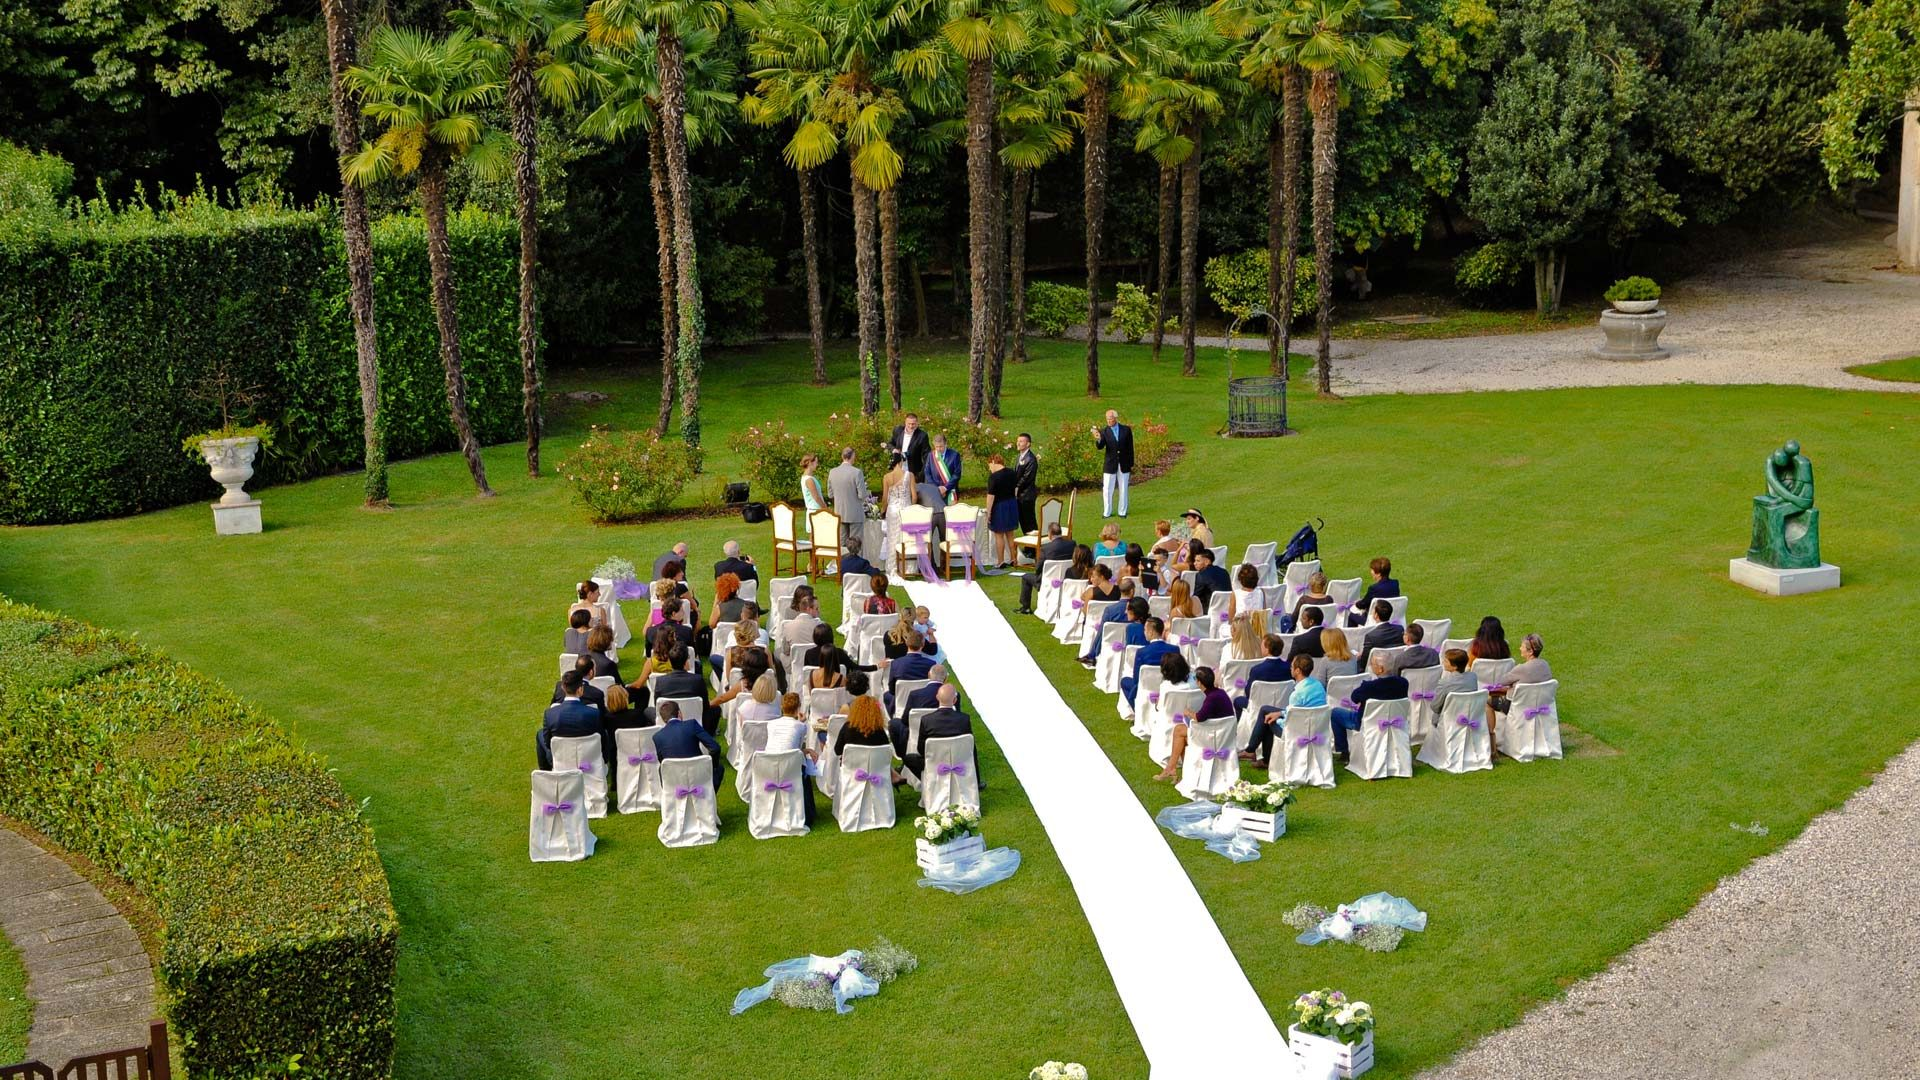 Matrimonio in giardino good matrimonio in giardino with - Matrimonio in giardino ...